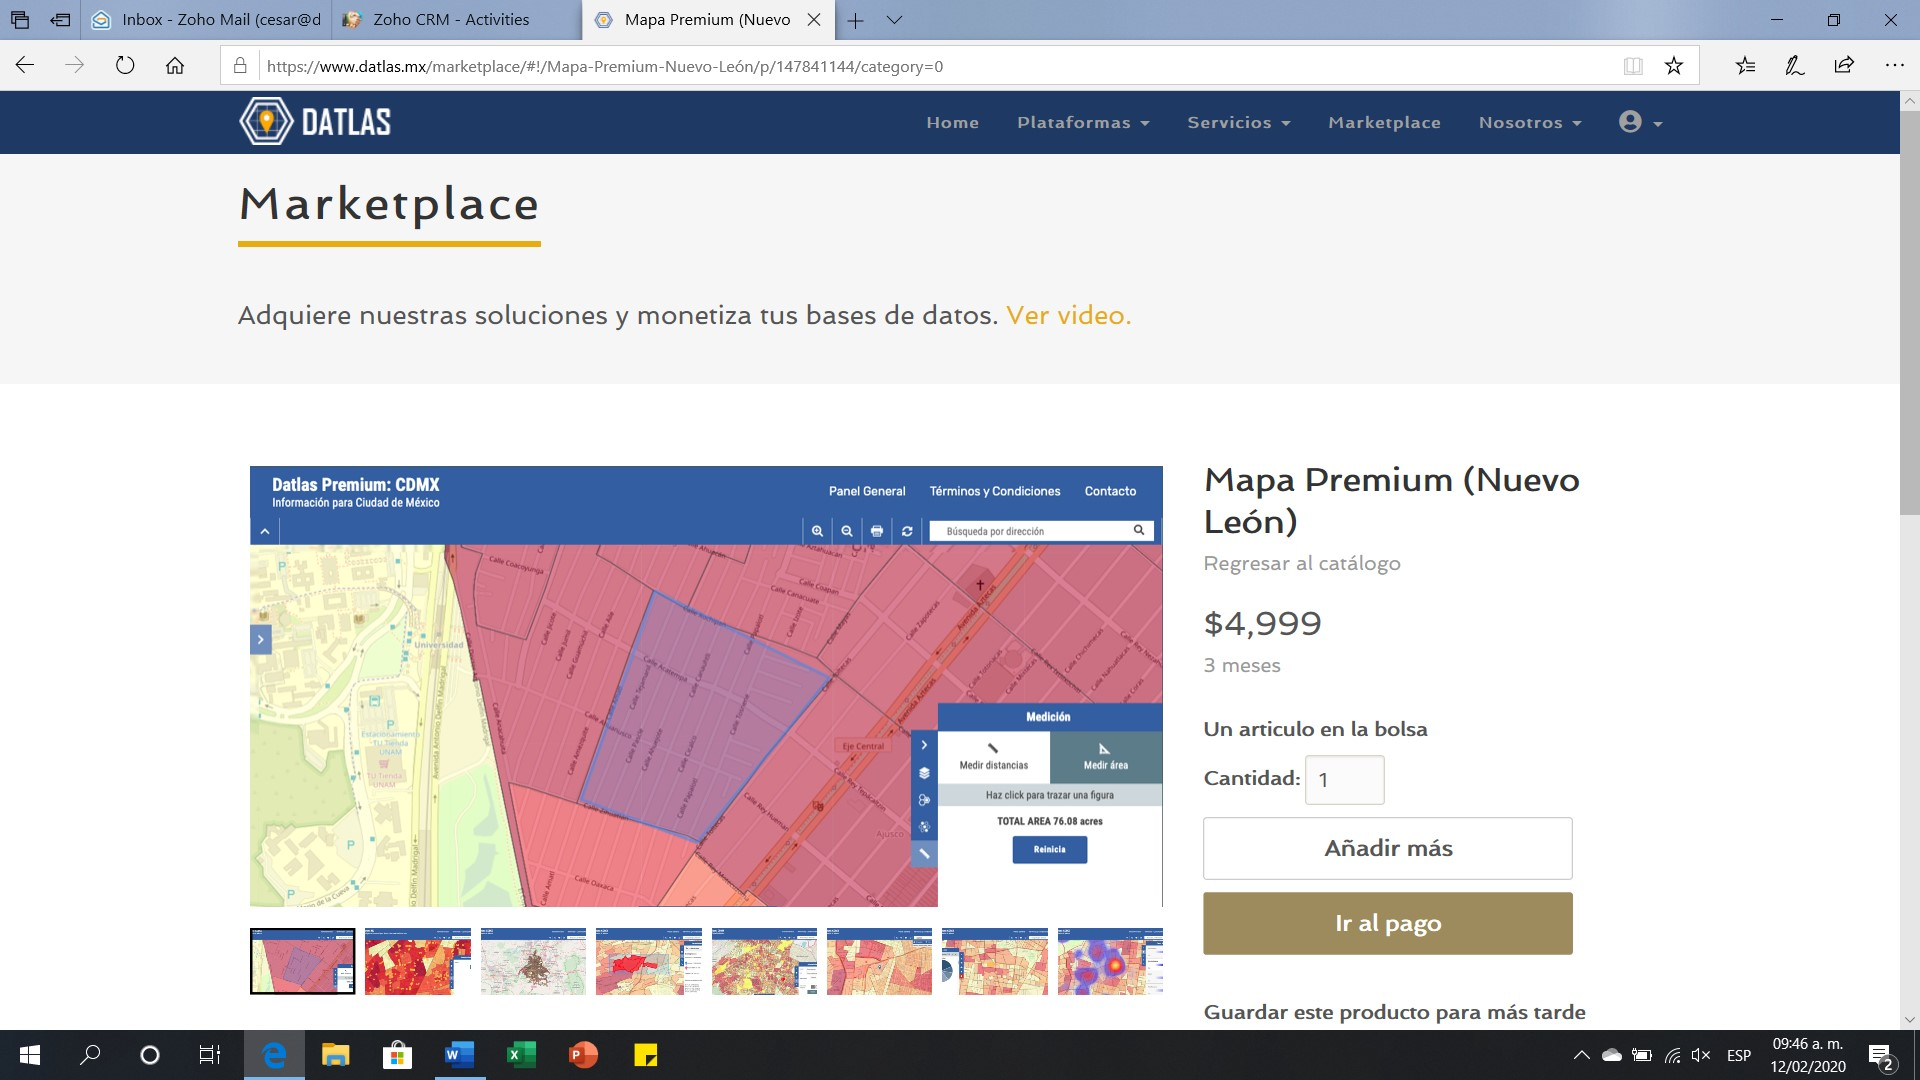 datlas_marketplace_mapa_premium_NL